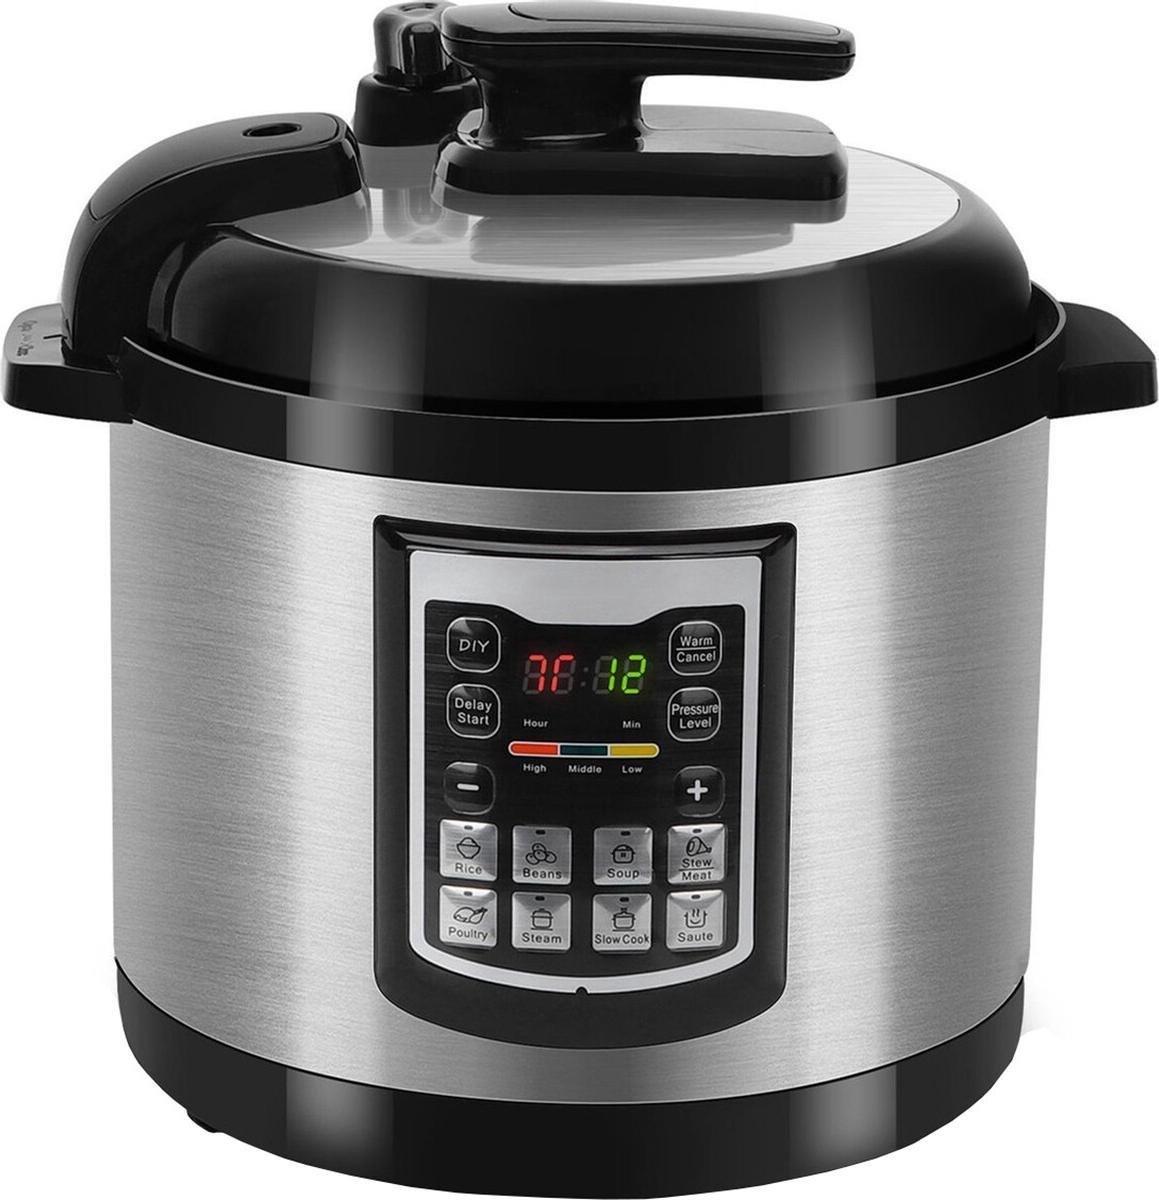 Qualu Multicooker Igia Miani Timer 6 Liter Zwart/Zilver online kopen